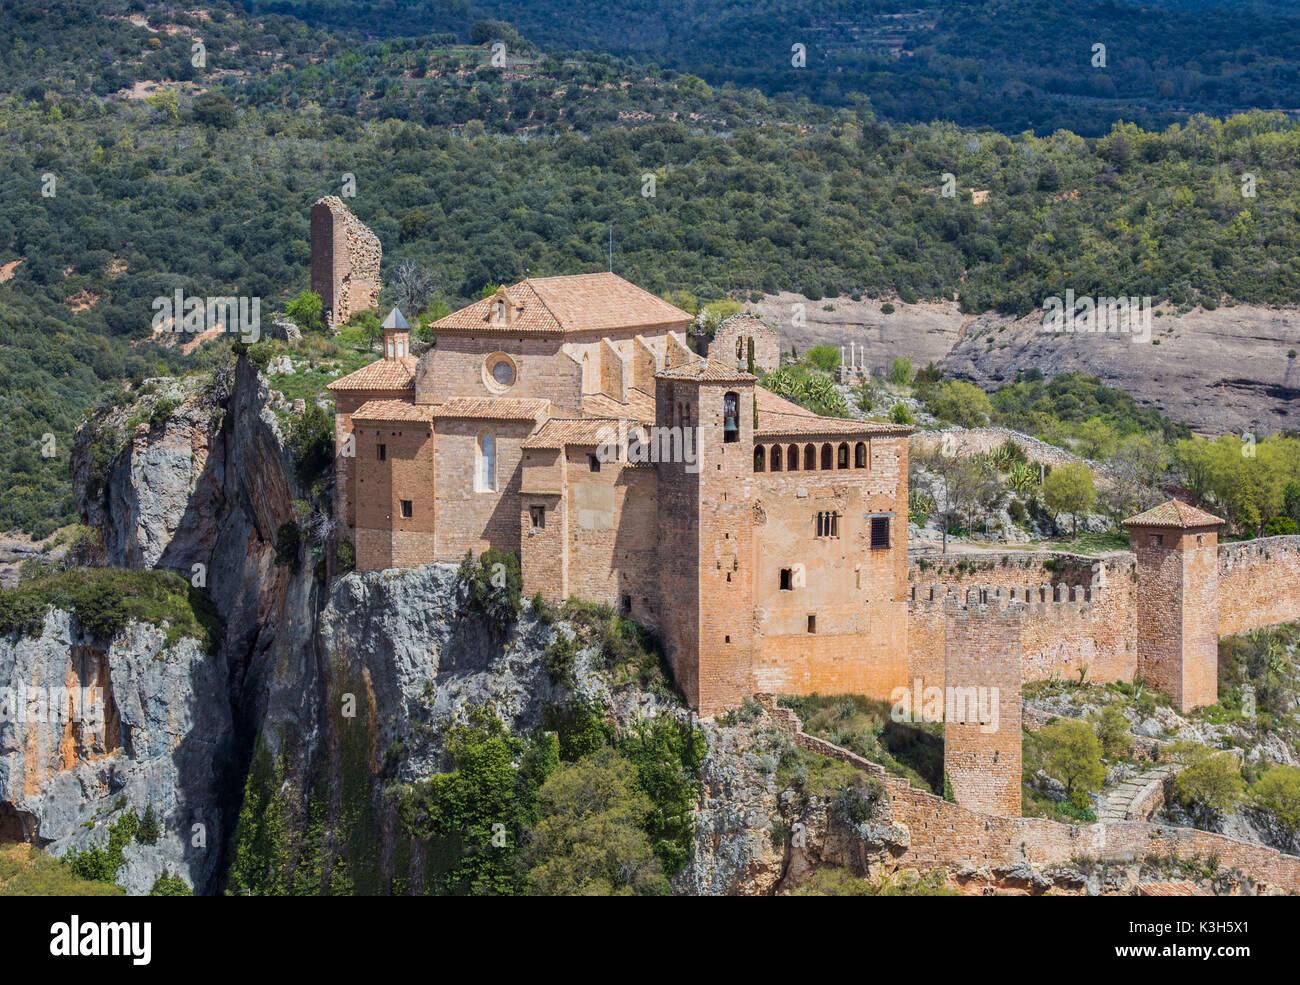 Spain, Huesca province, Alquezar City, Santa Maria Colegiata - Stock Image